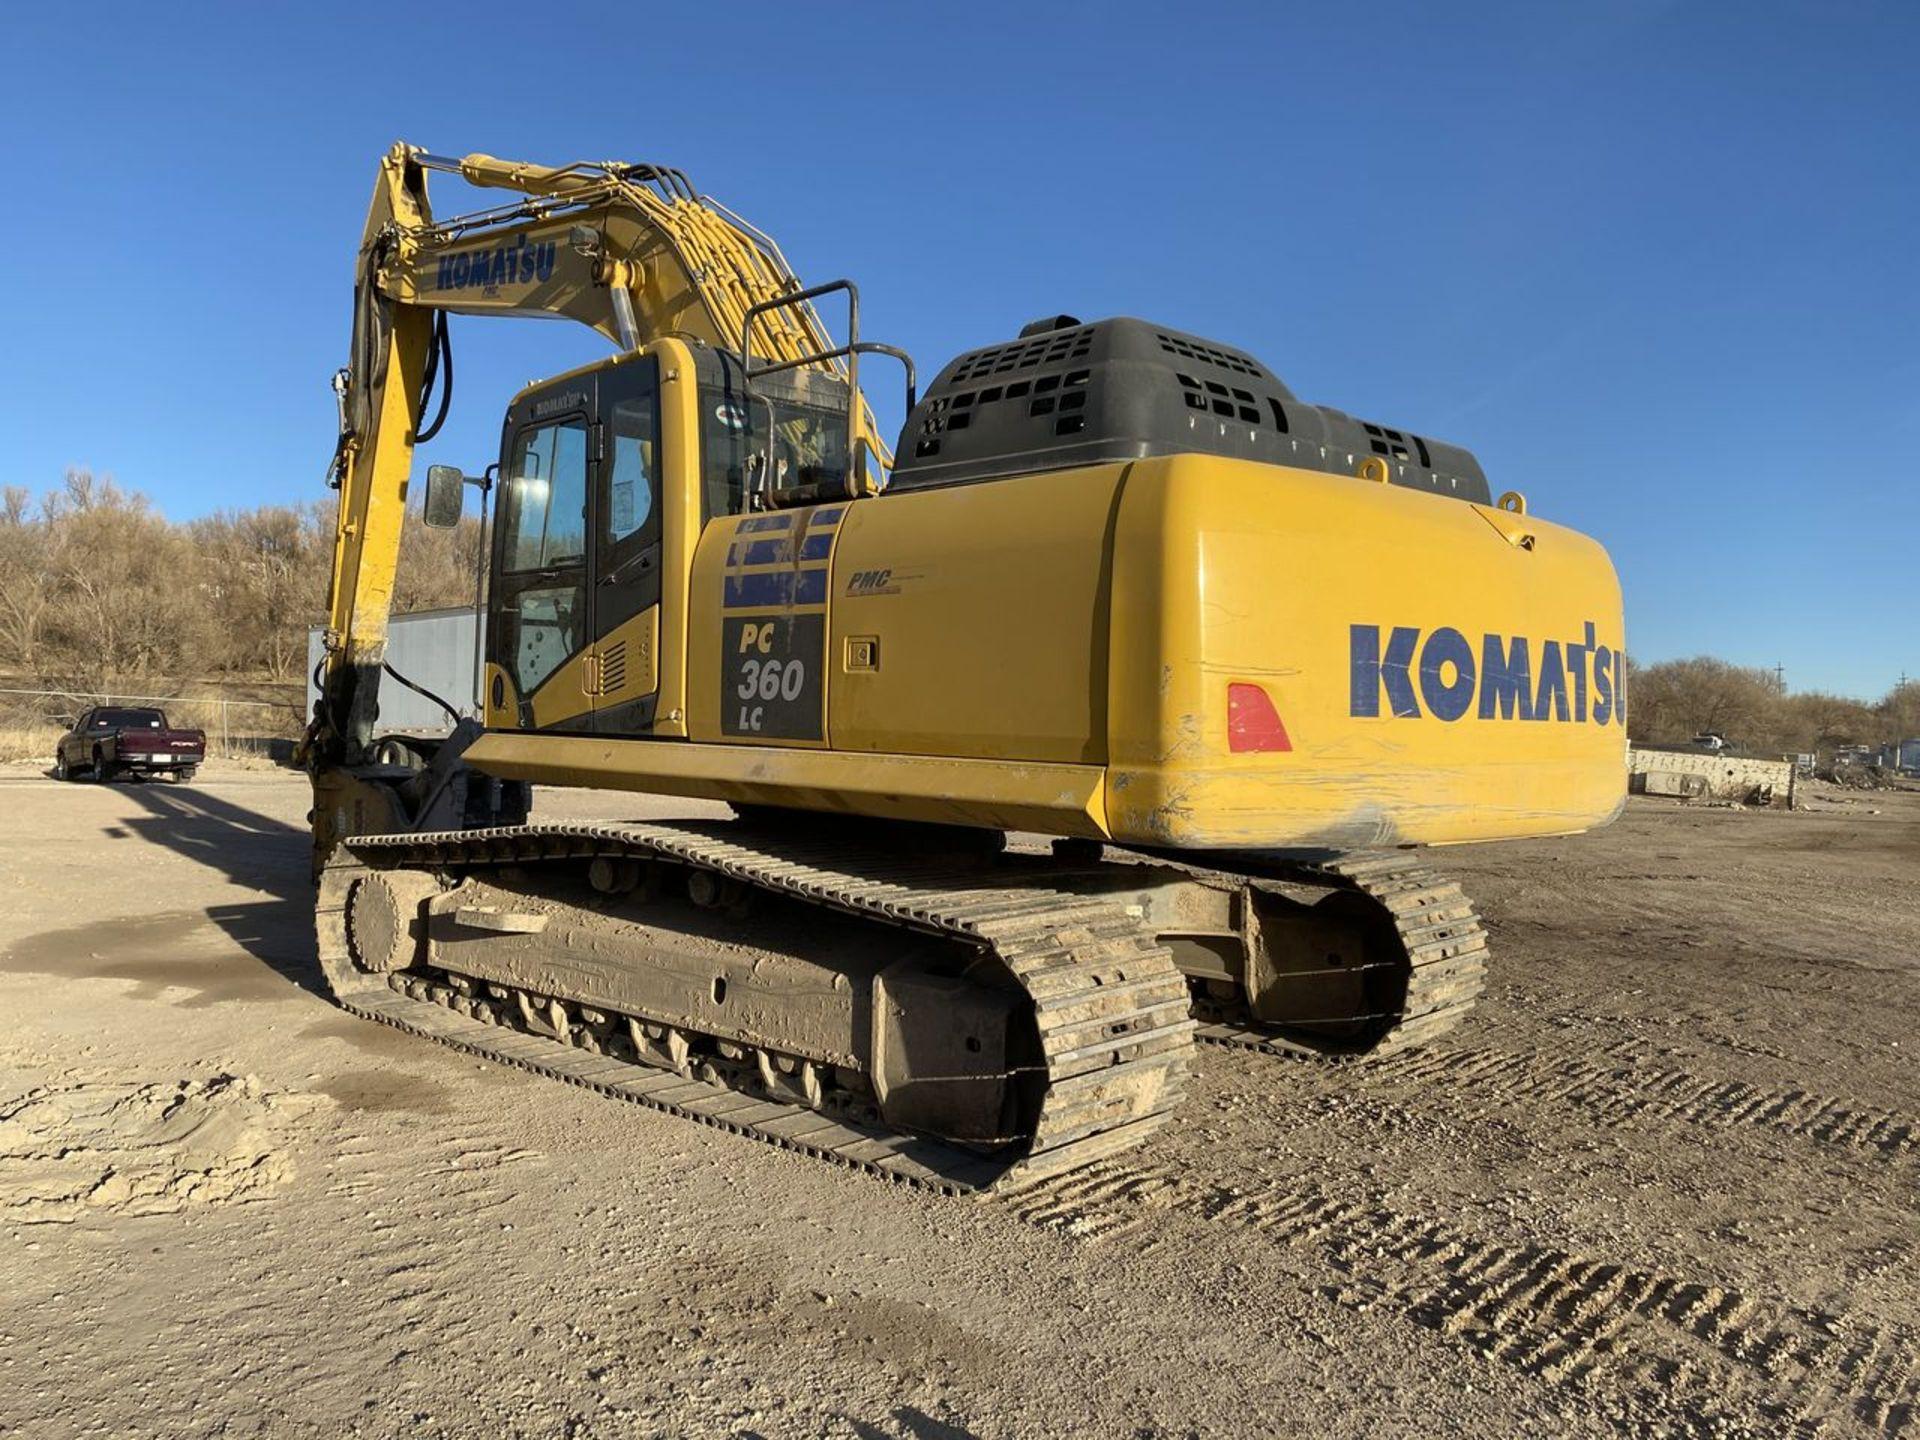 2018 Komatsu PC360LC-11 Hydraulic Crawler Excavator, S/N: A36863, PIN: KMTPC256CJWA36863; with 2,883 - Image 12 of 19